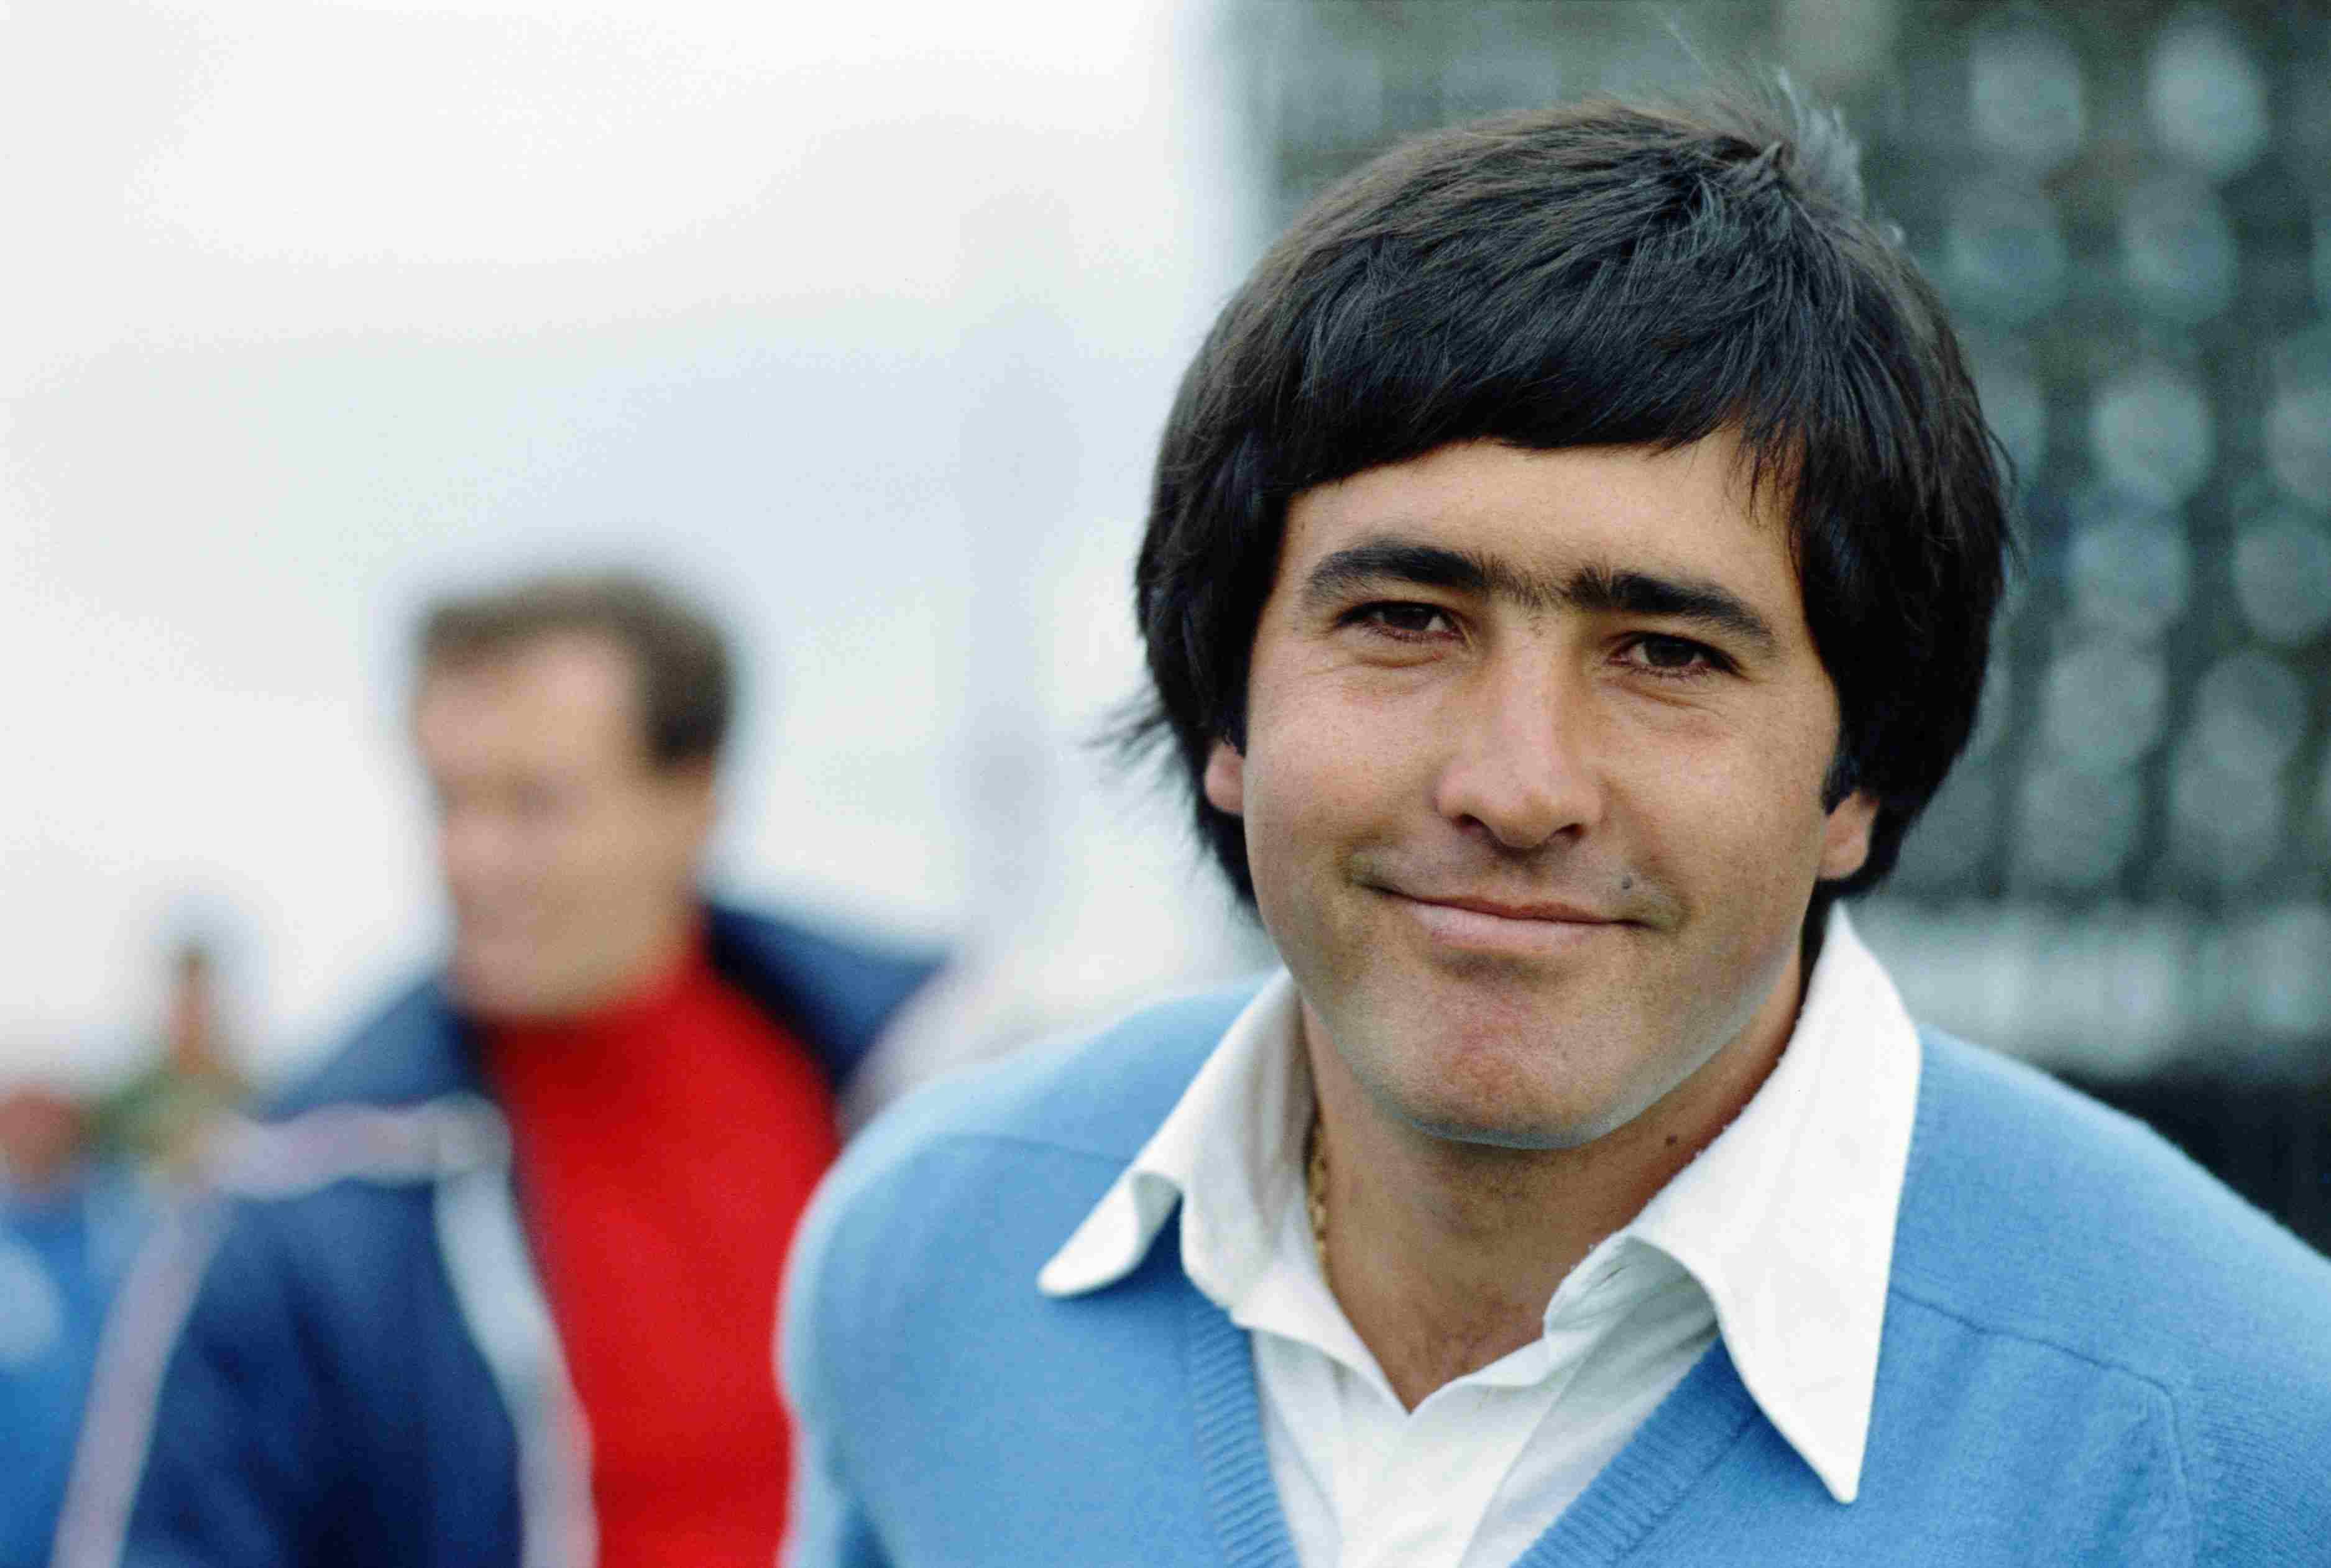 Golfer Seve Ballesteros pictured in 1977.